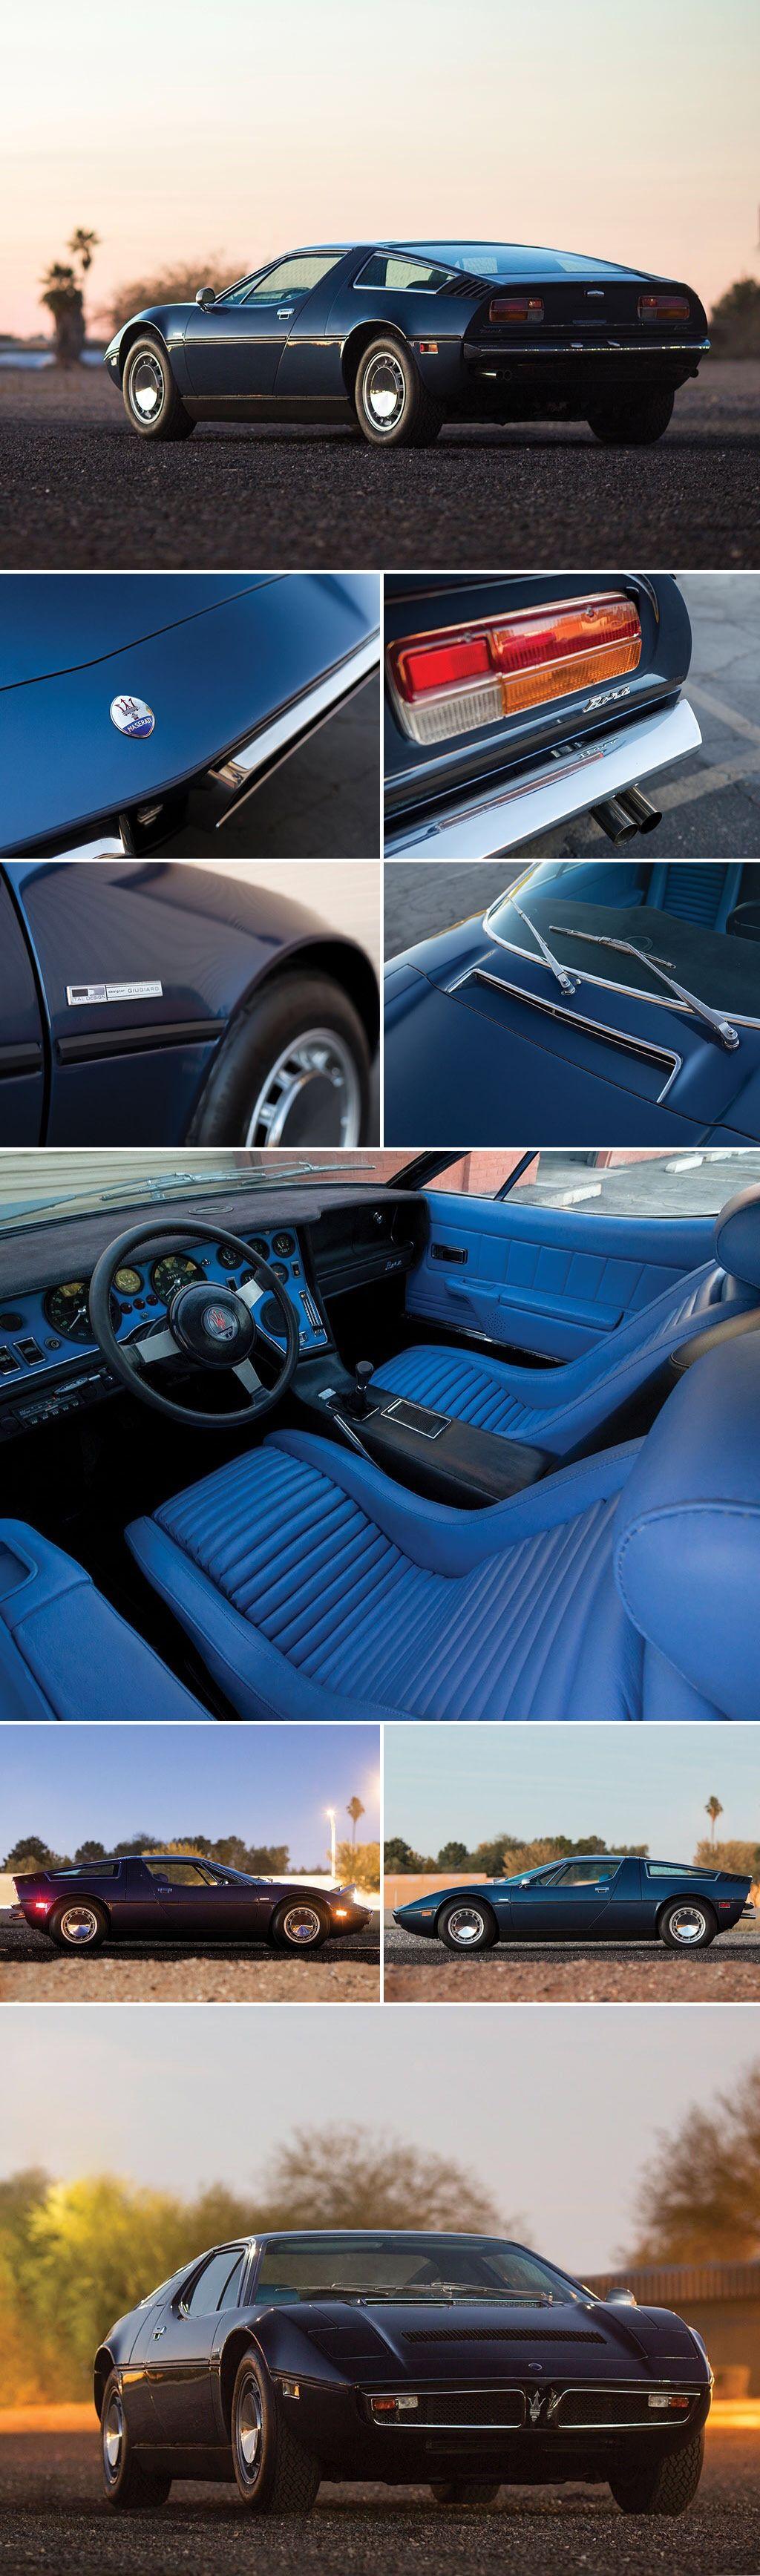 1975 Maserati Bora 4.9 | Maserati bora, Maserati sports ...